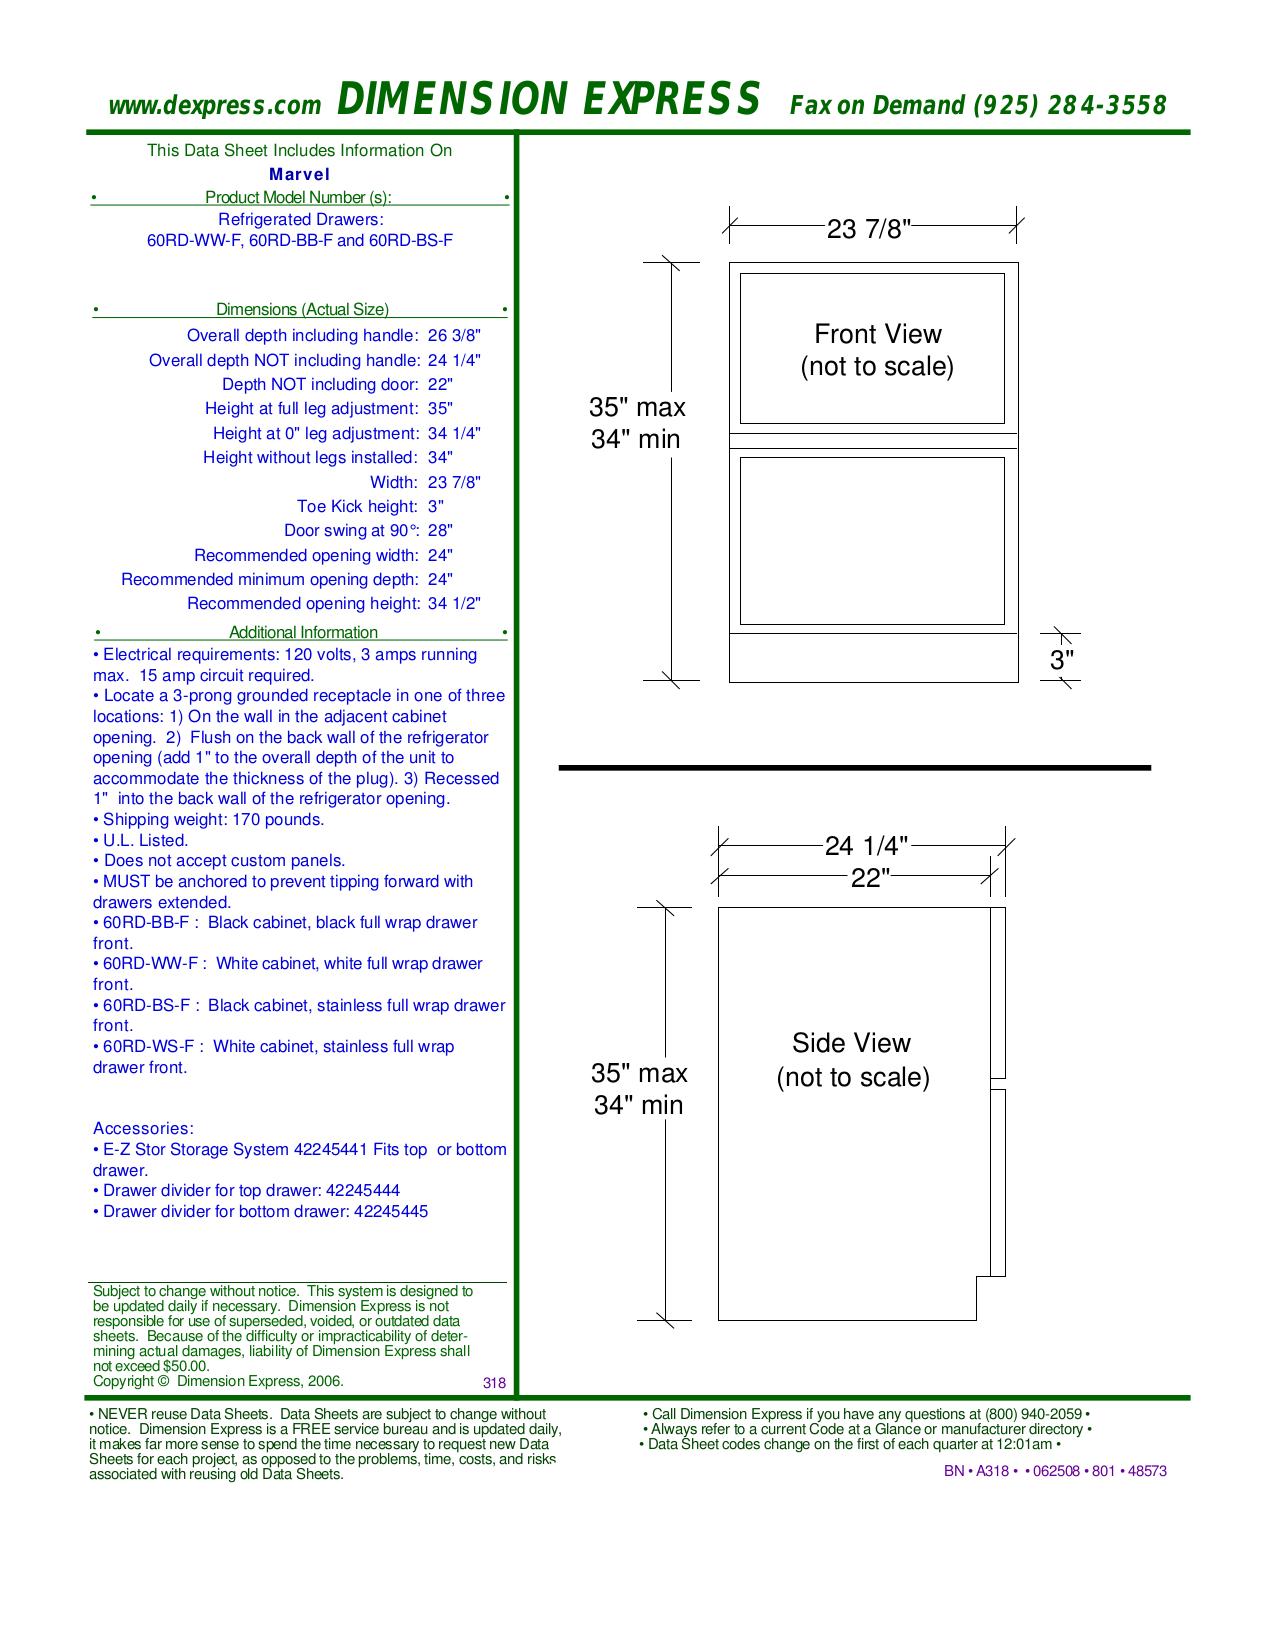 pdf for Marvel Refrigerator 60RD-BB-O manual